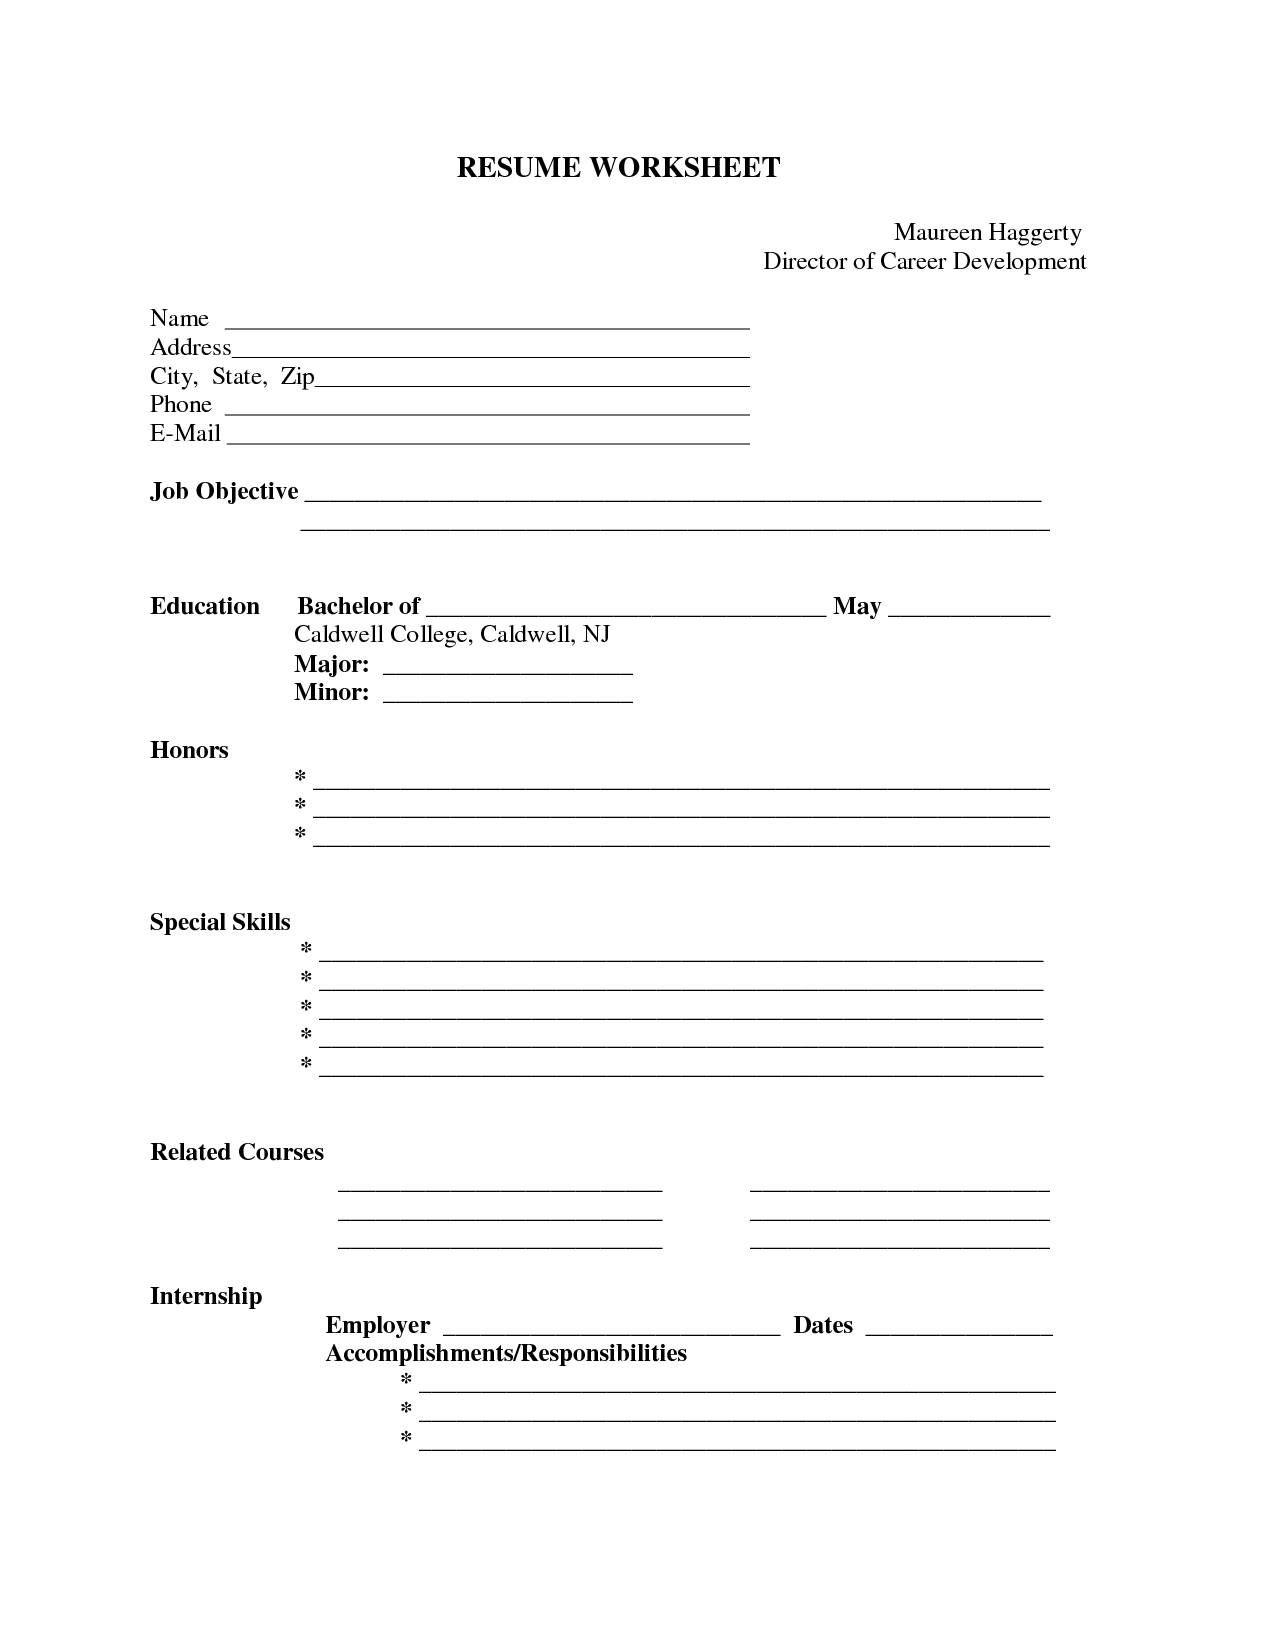 Pinresumejob On Resume Job   Resume Form, Free Printable Resume - Free Printable Resume Templates